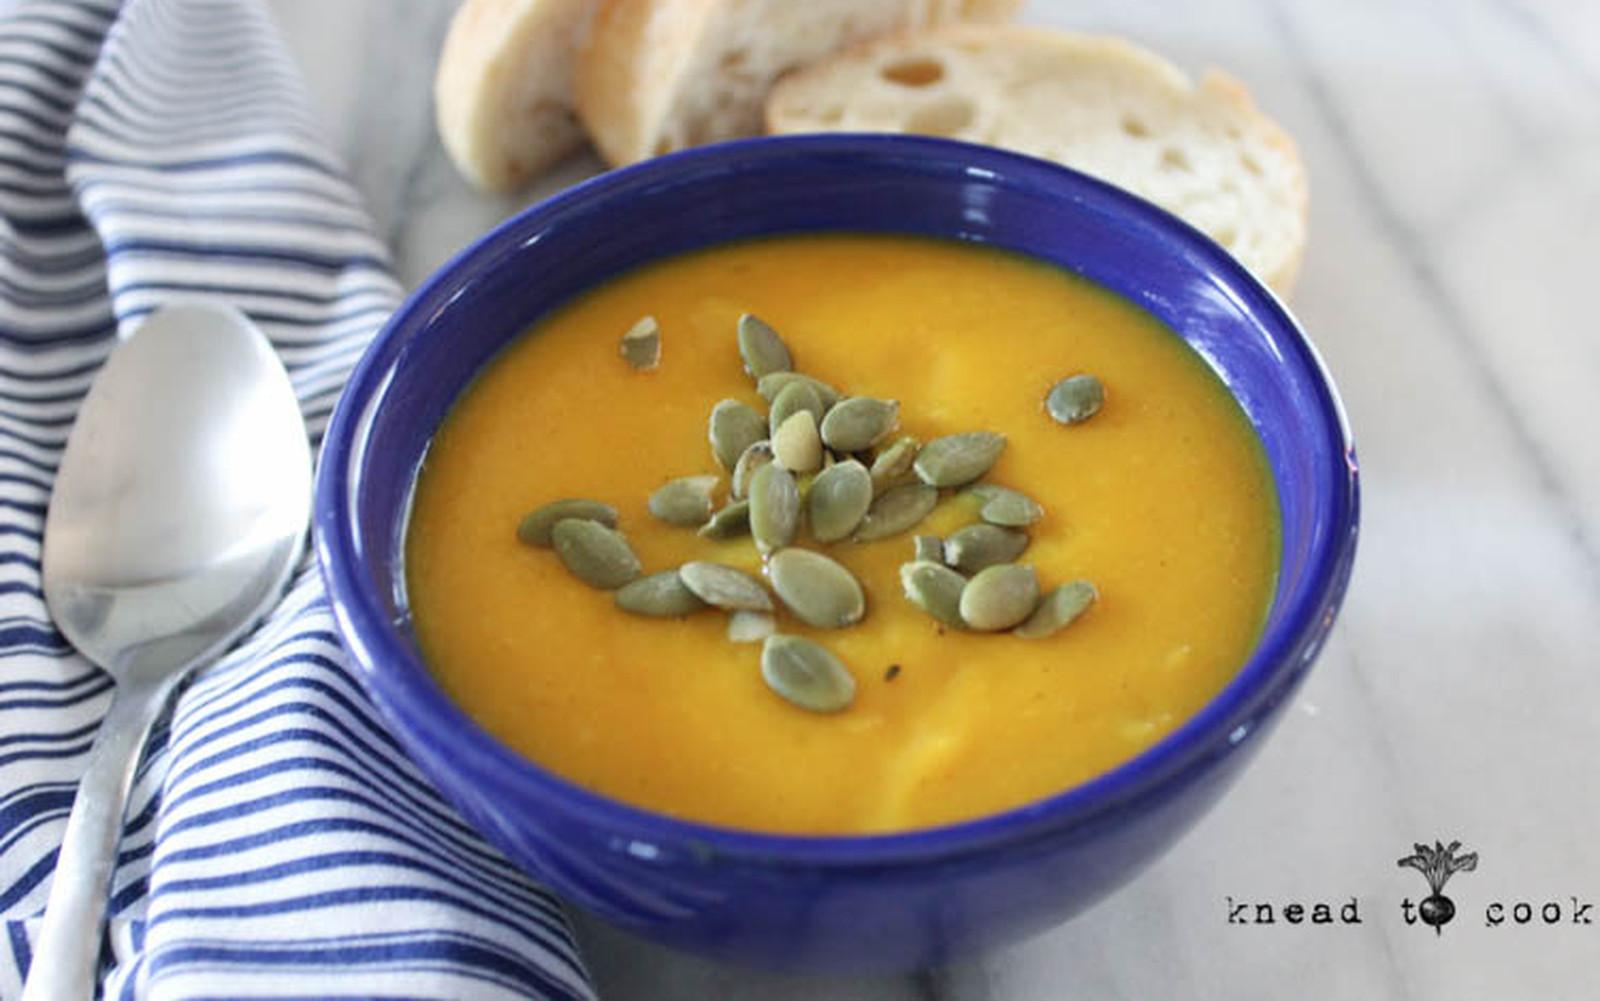 Creamy Kohlrabi Soup [Vegan, Gluten-Free]